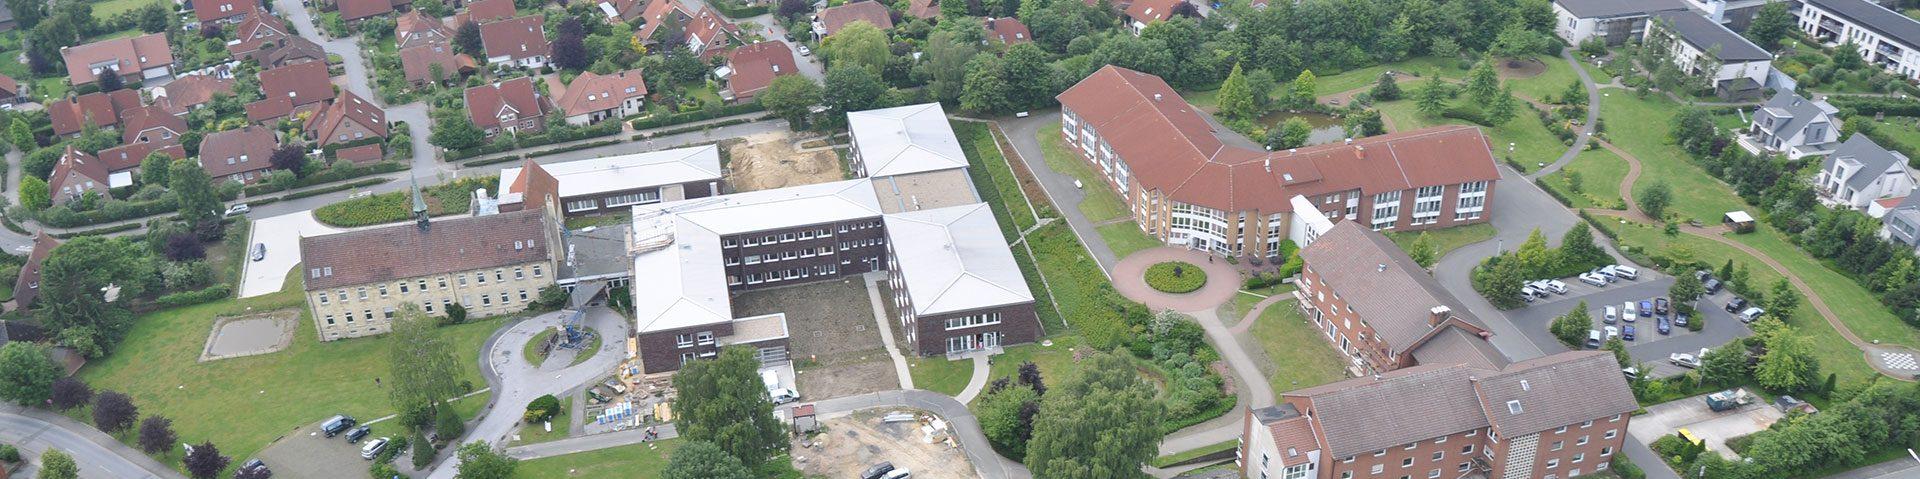 Luftaufnahme Christophorus Klinik